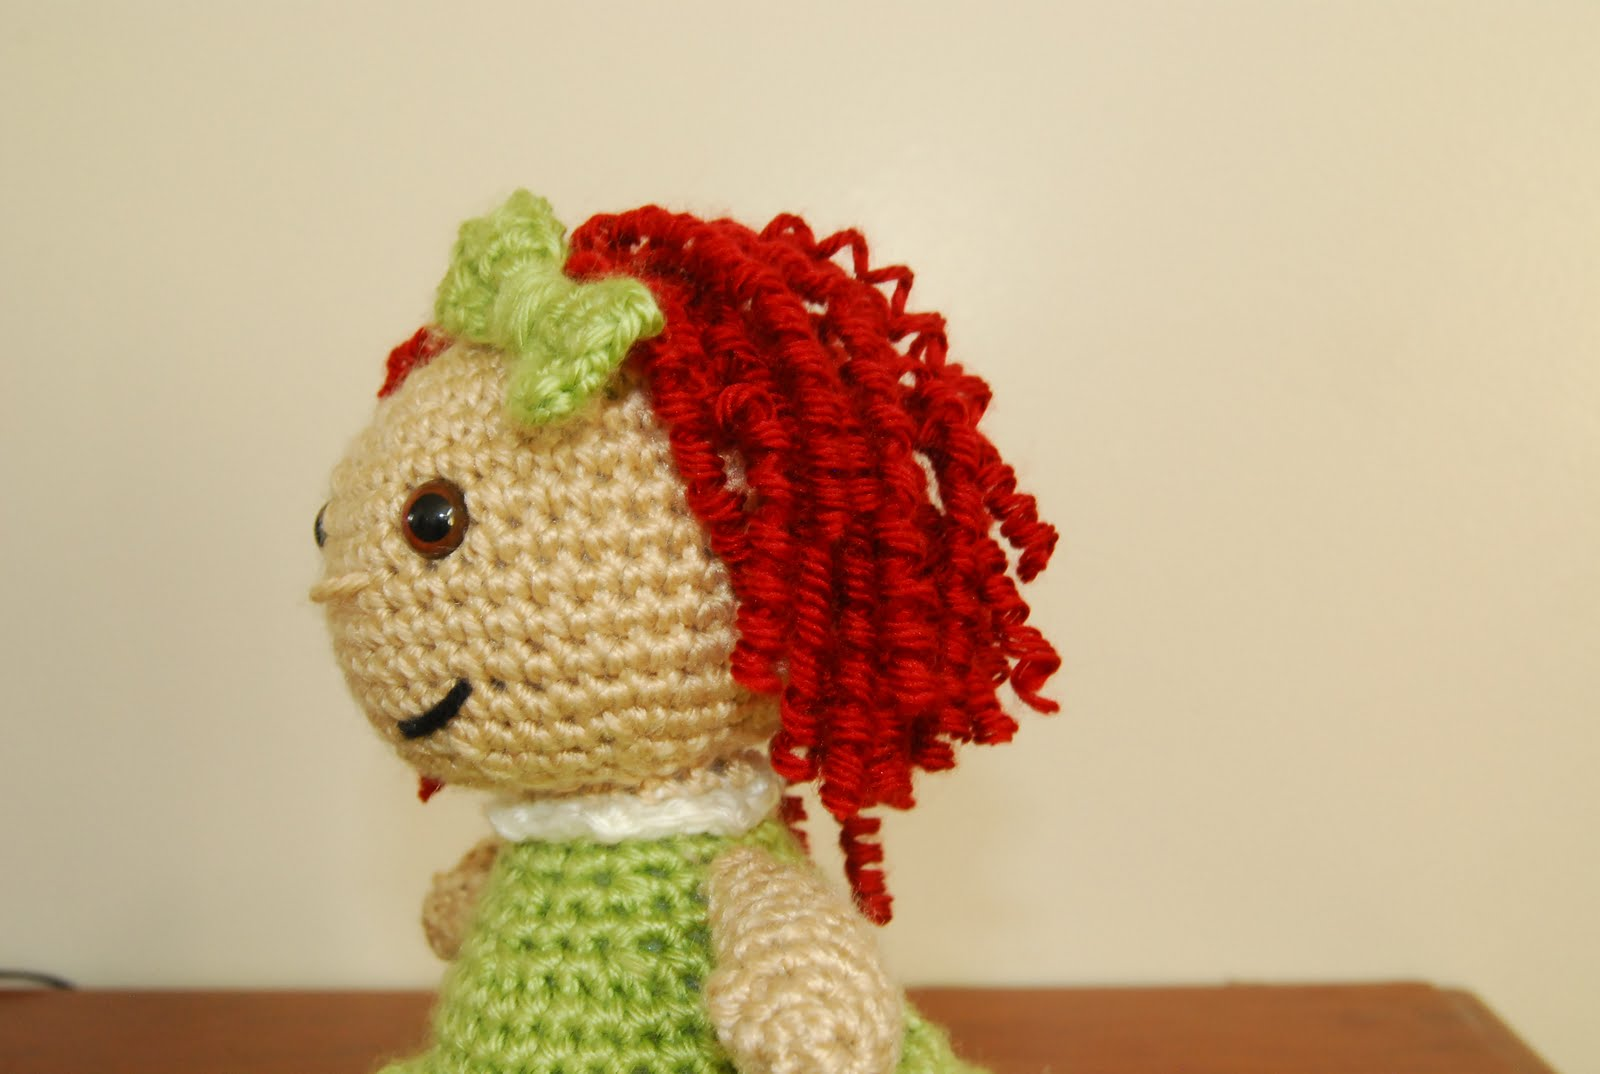 Amigurumi Hair Curly : Sam the SAHM: Curling Yarn Hair